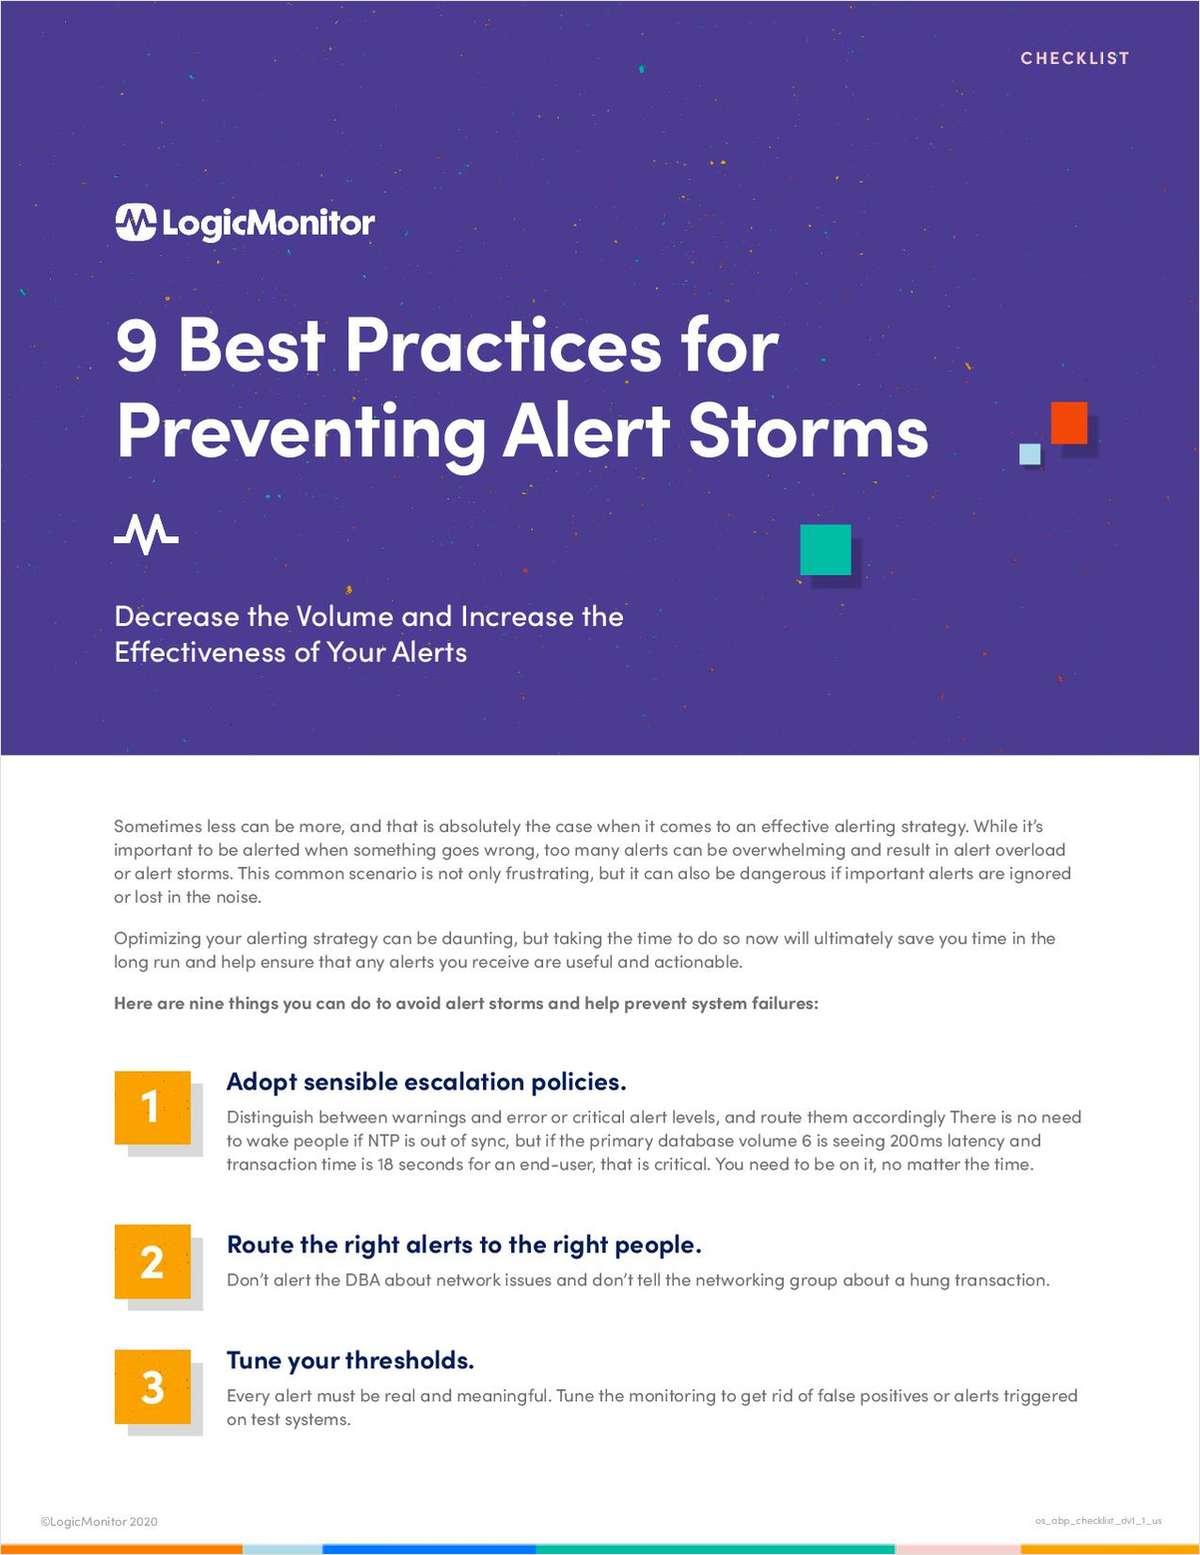 9 Best Practices for Avoiding Alert Storms